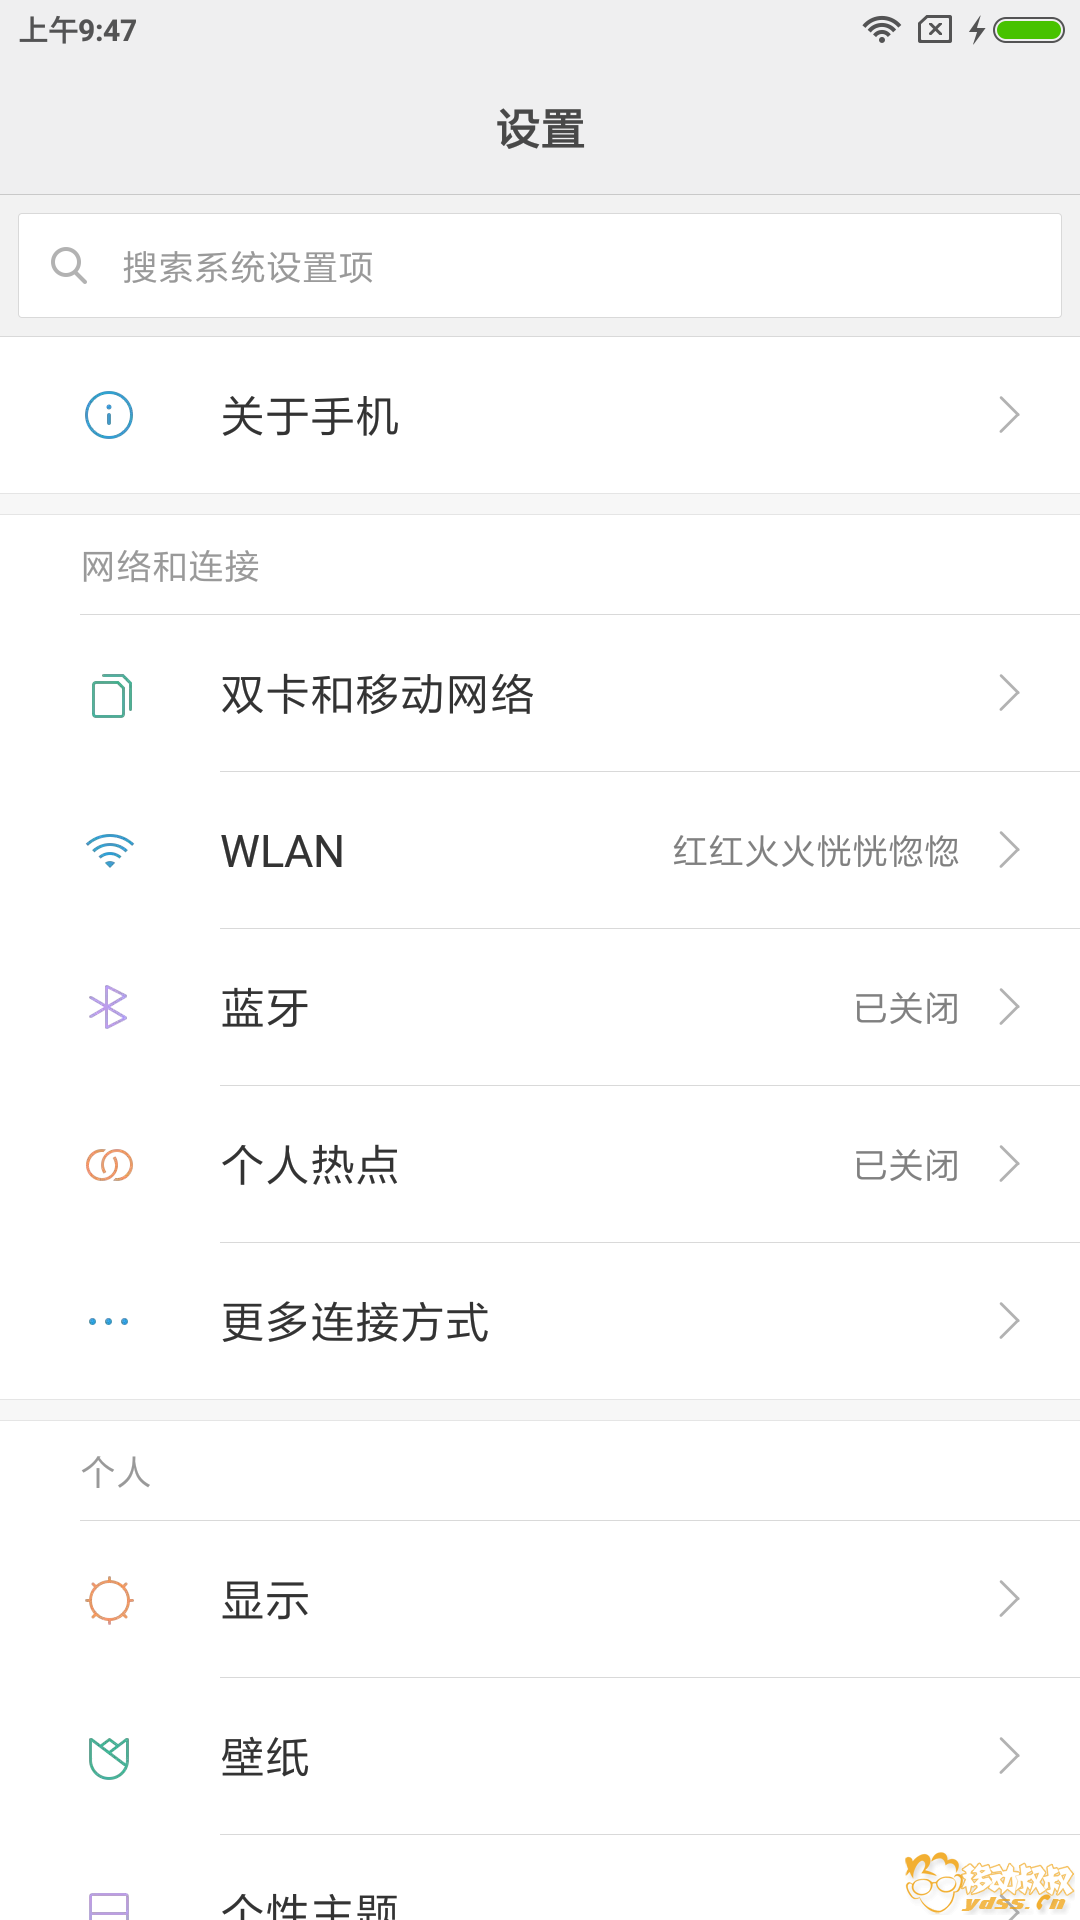 Screenshot_2018-03-22-09-47-37-018_com.android.settings.png